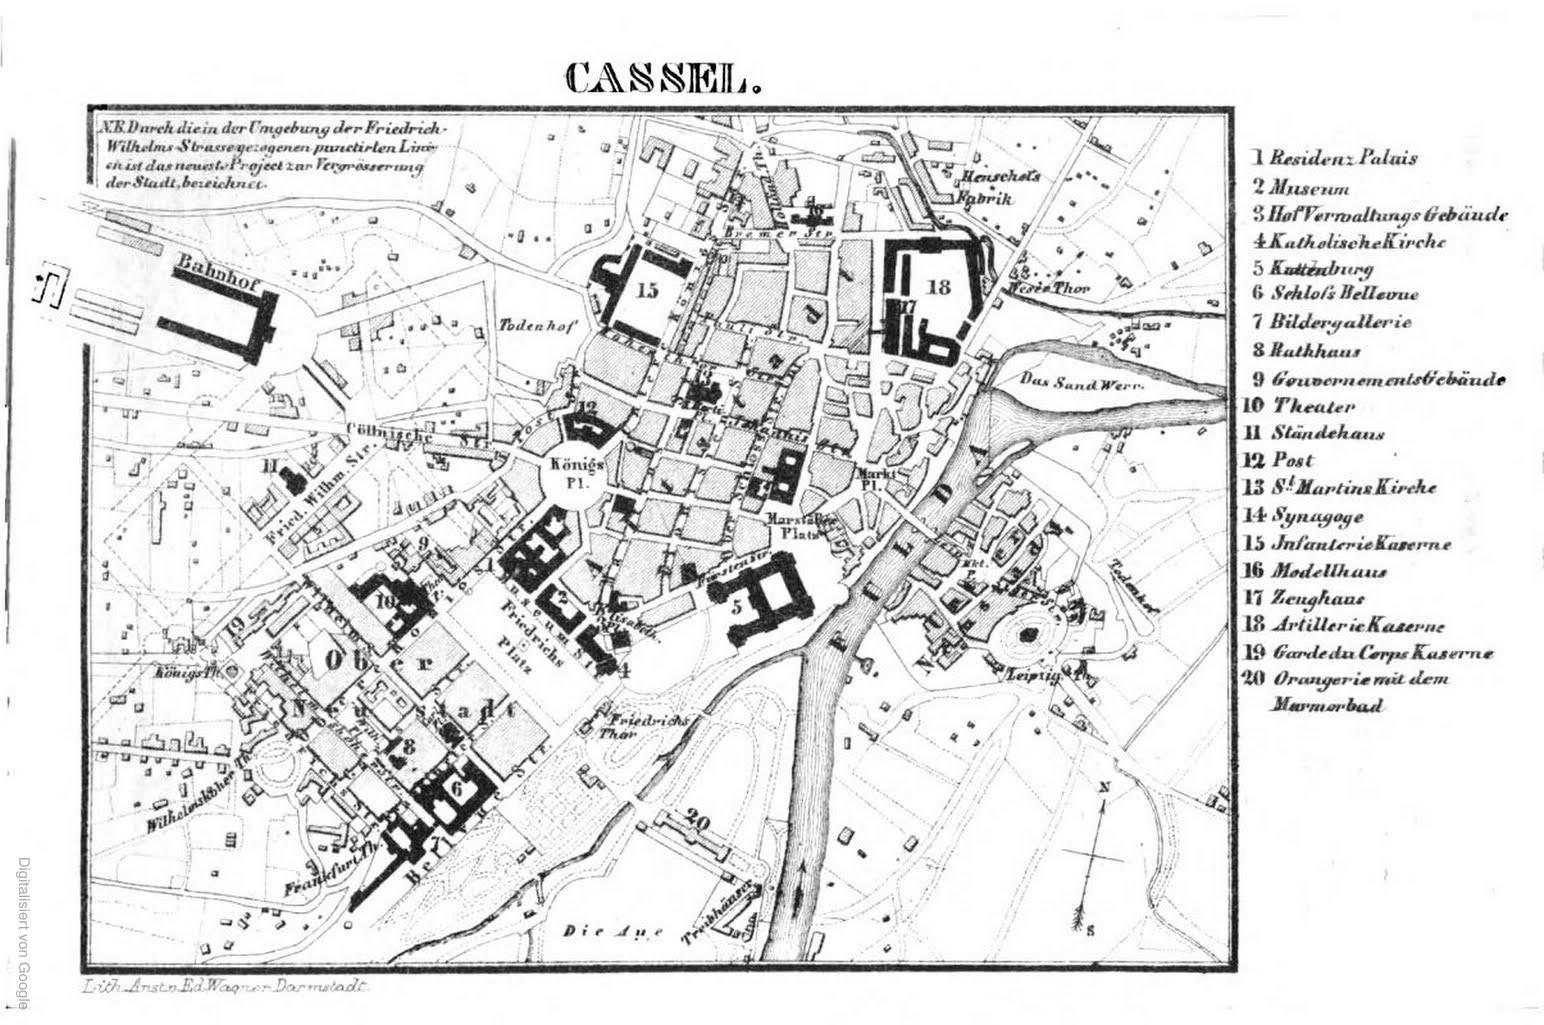 FileKassel map 1860jpg Wikimedia Commons